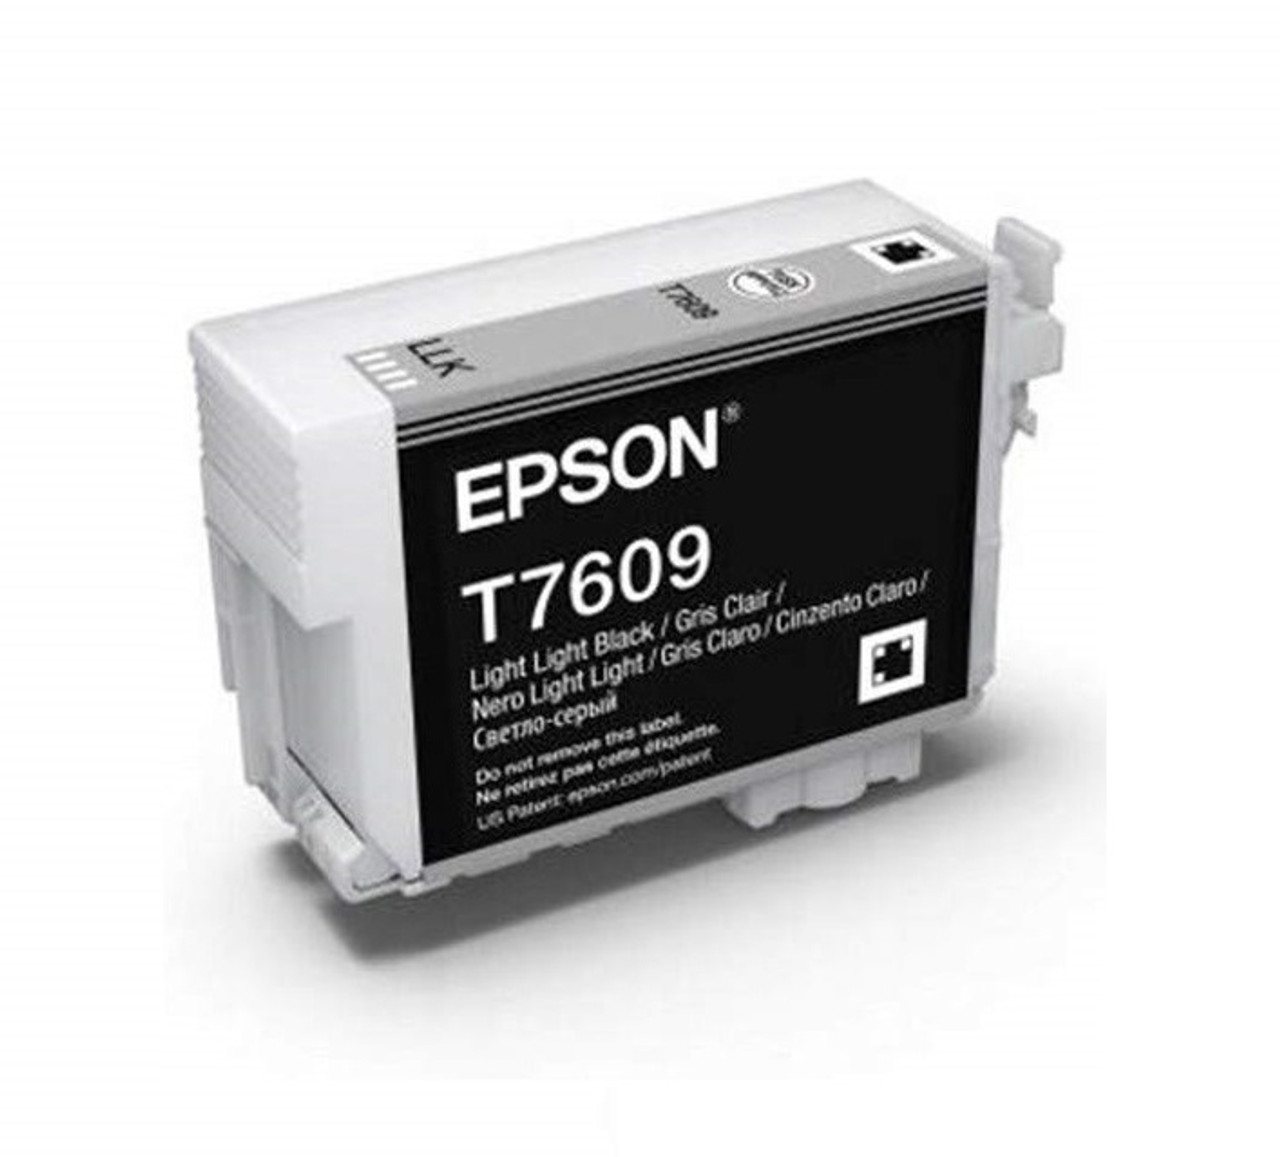 EPSON C13T760900 T7609 INK CARTRIDGE ULTRACHROME HD LIGHT LIGHT BLACK